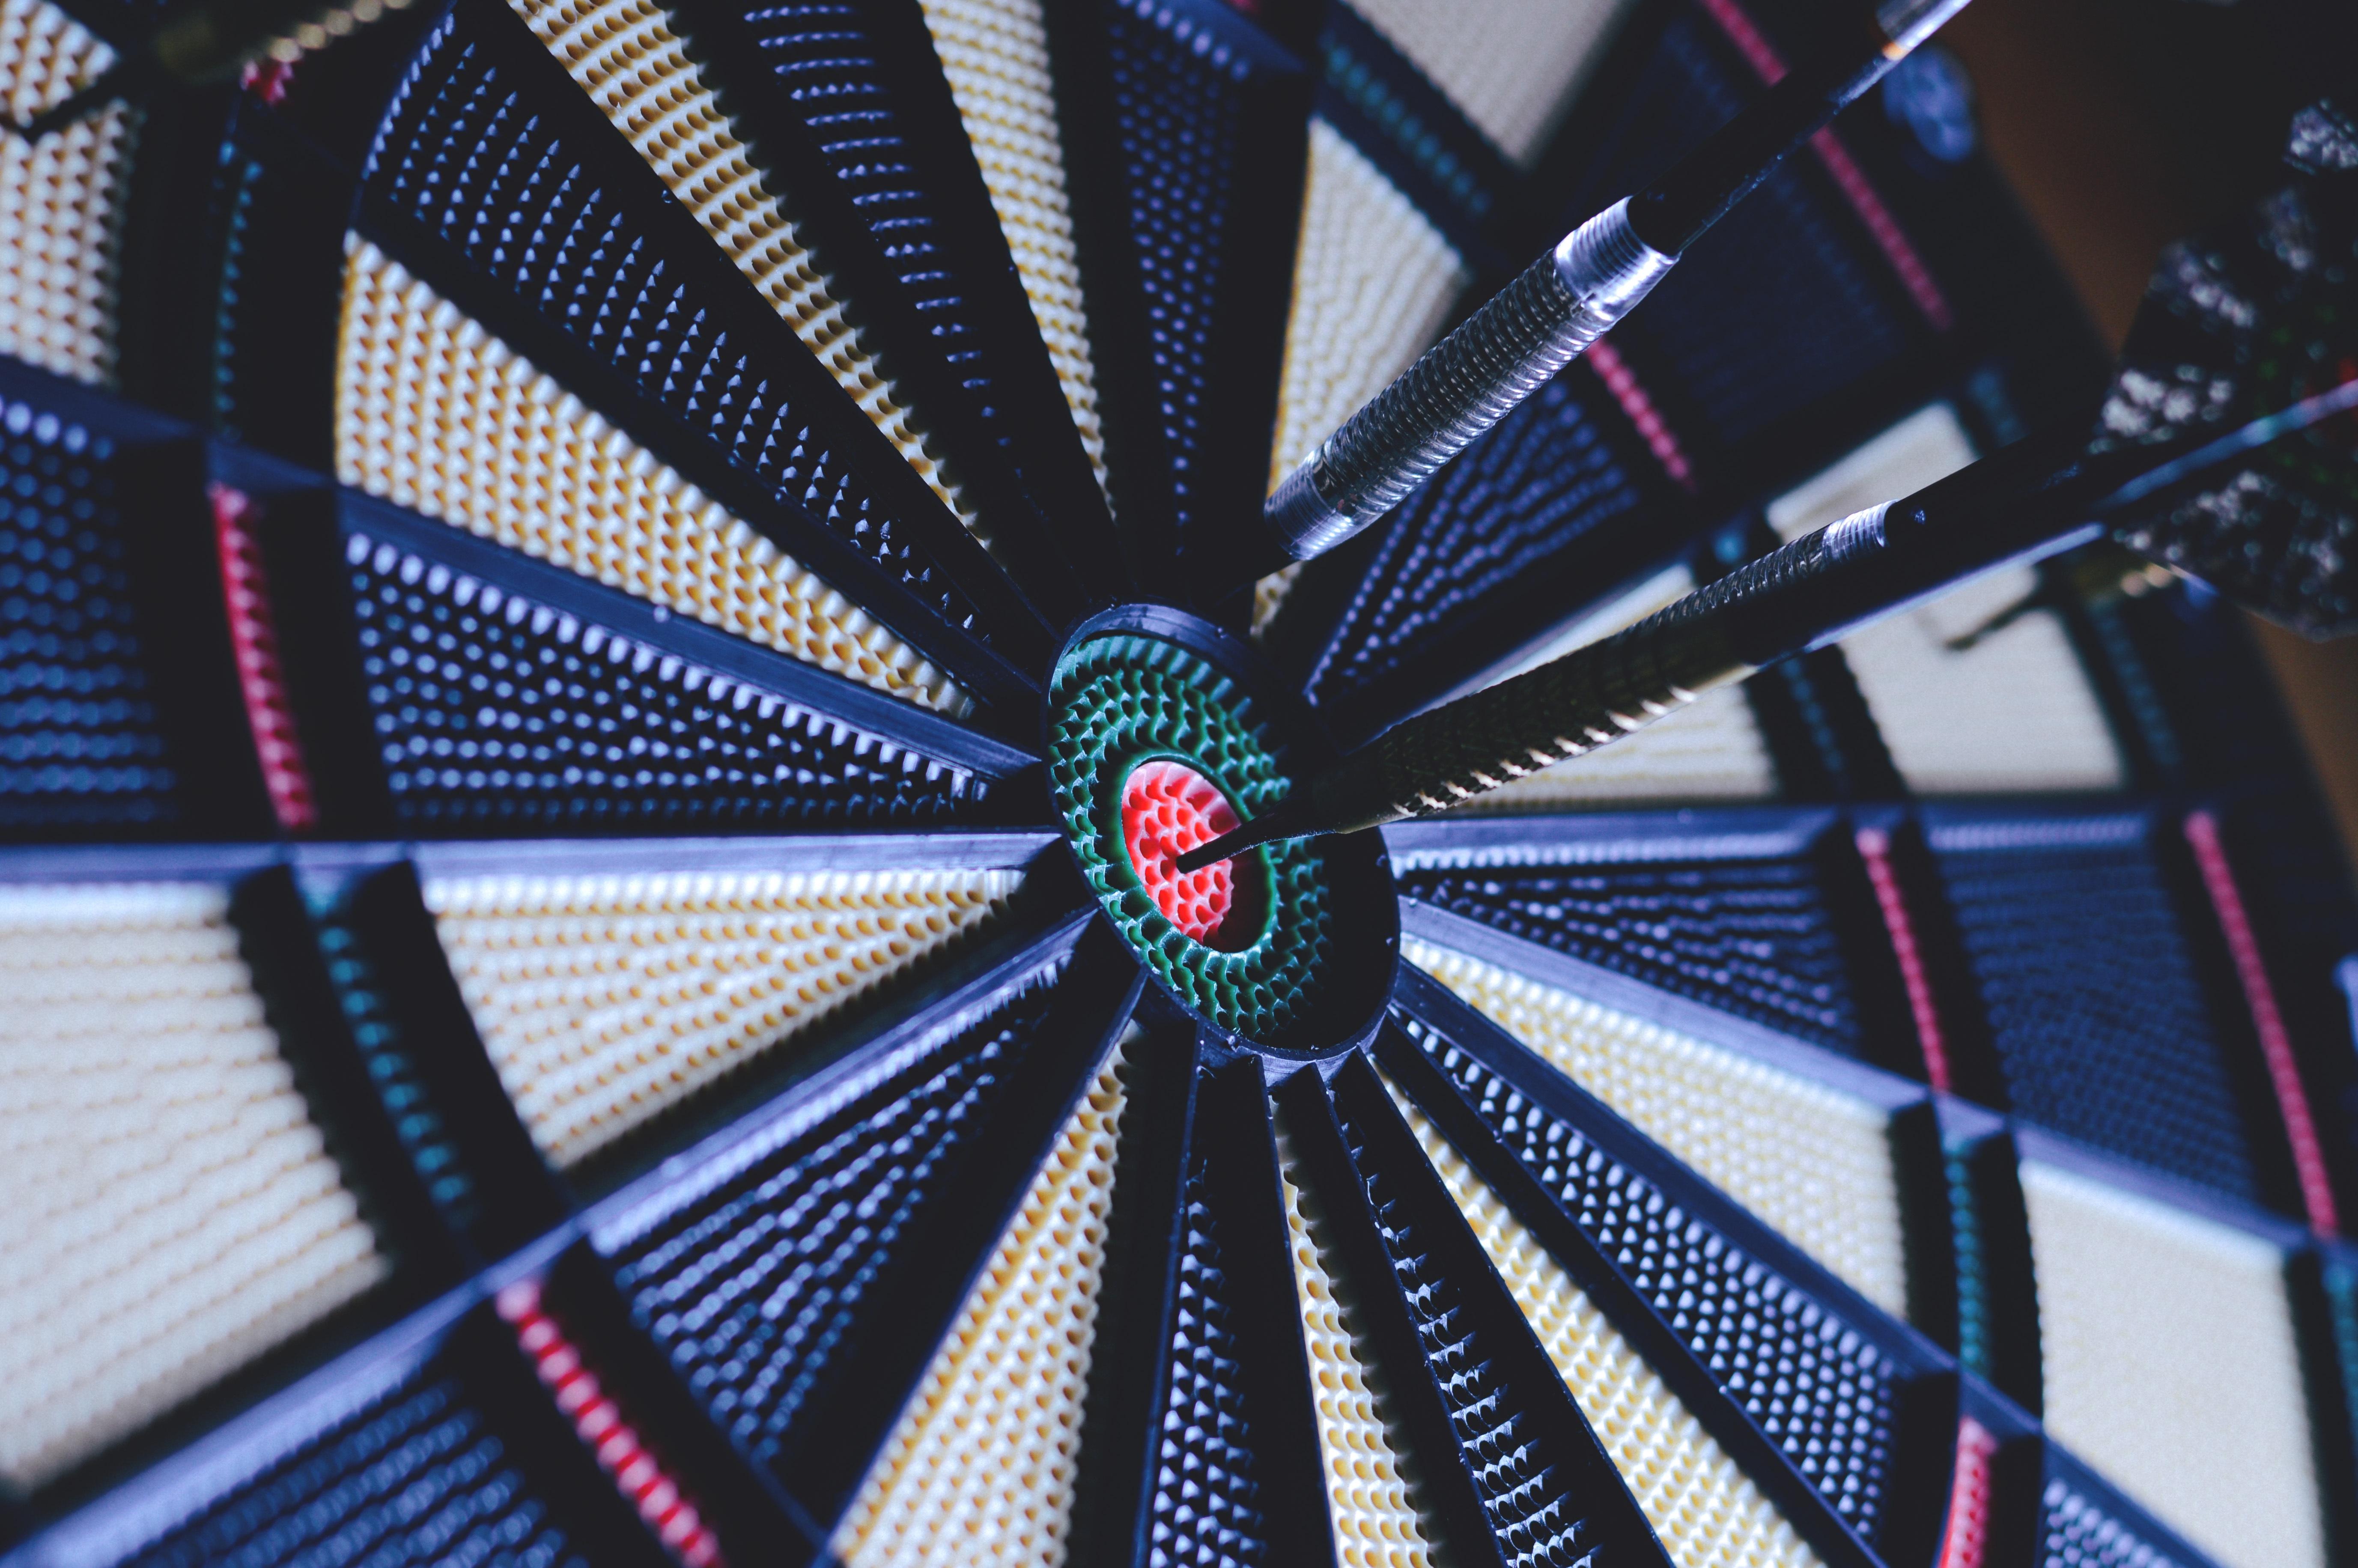 free images recreation blue symmetry darts bullseye dart